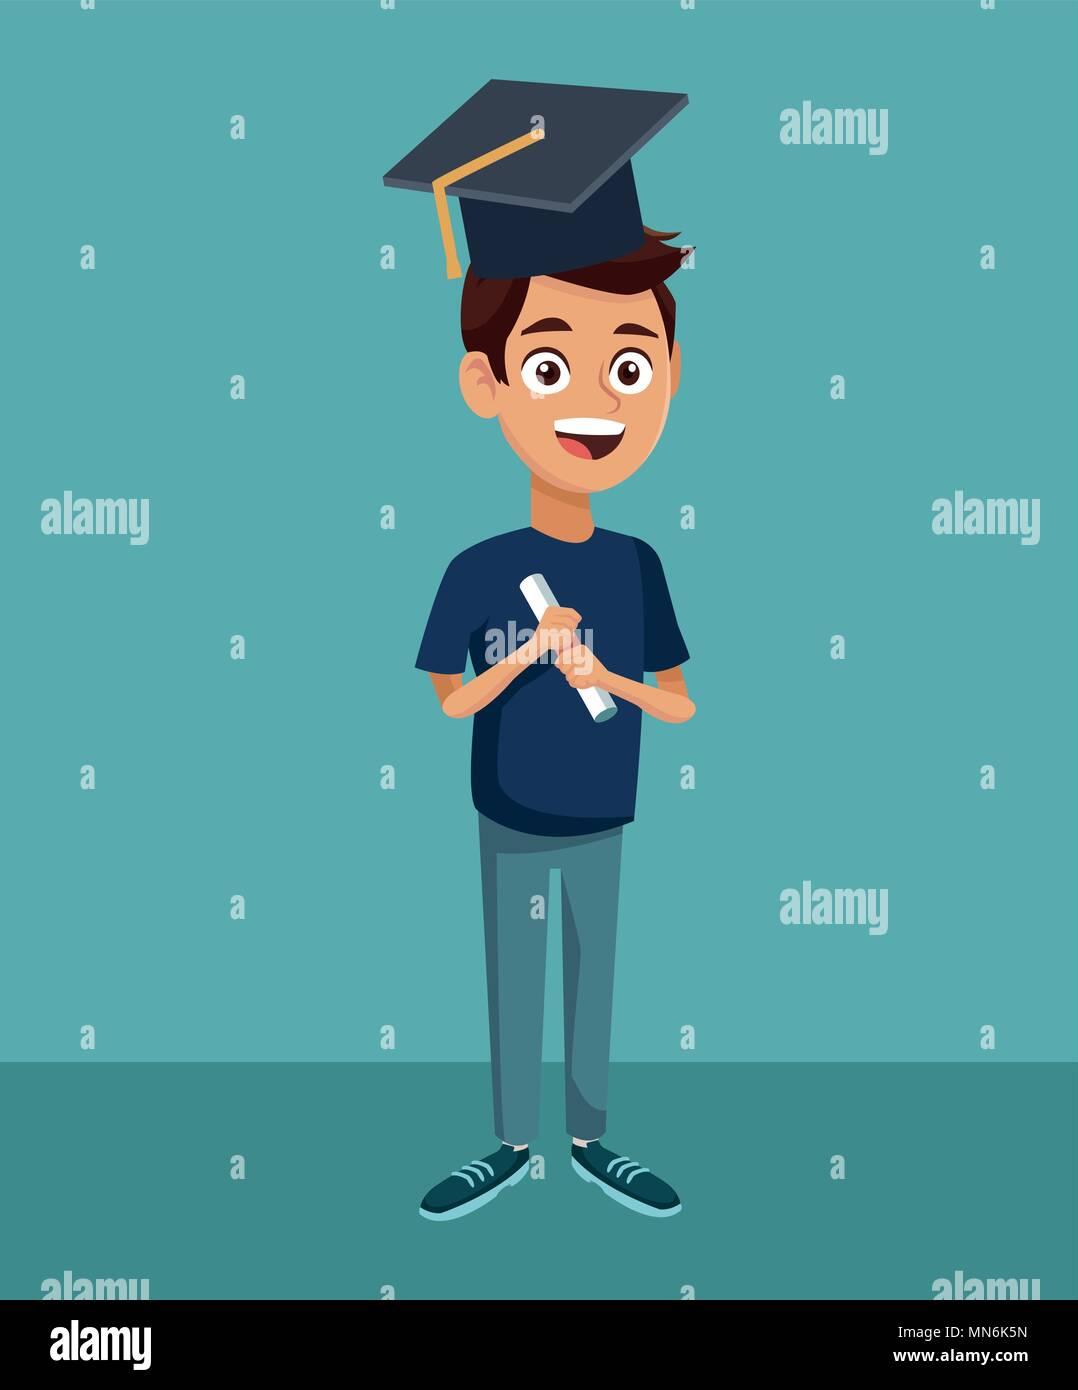 High School Ausbildung Cartoon Vektor Abbildung Bild 185158225